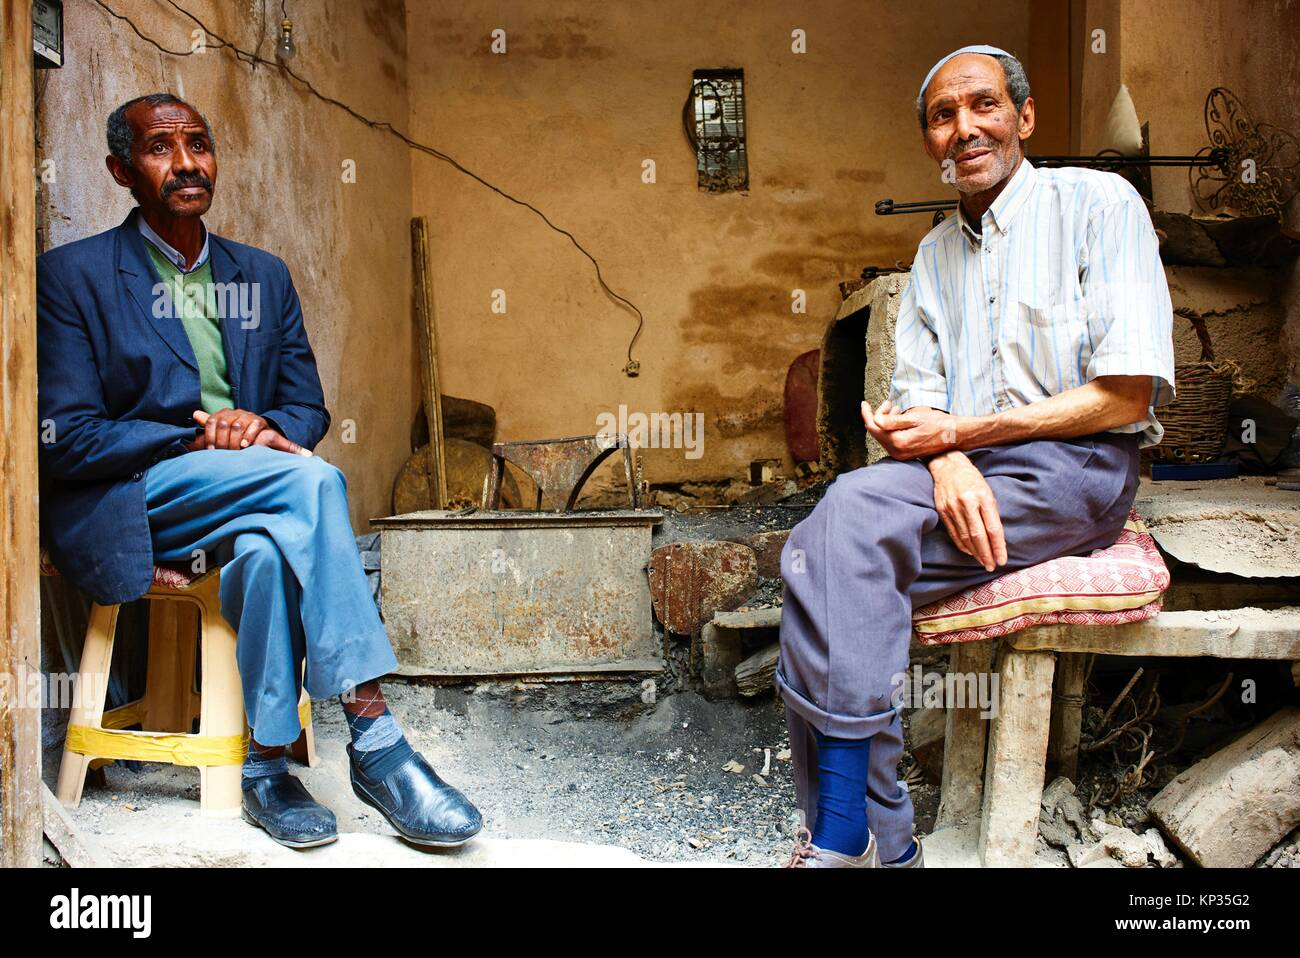 Two senior men relaxing in the medina of Fez, Morocco - Stock Image